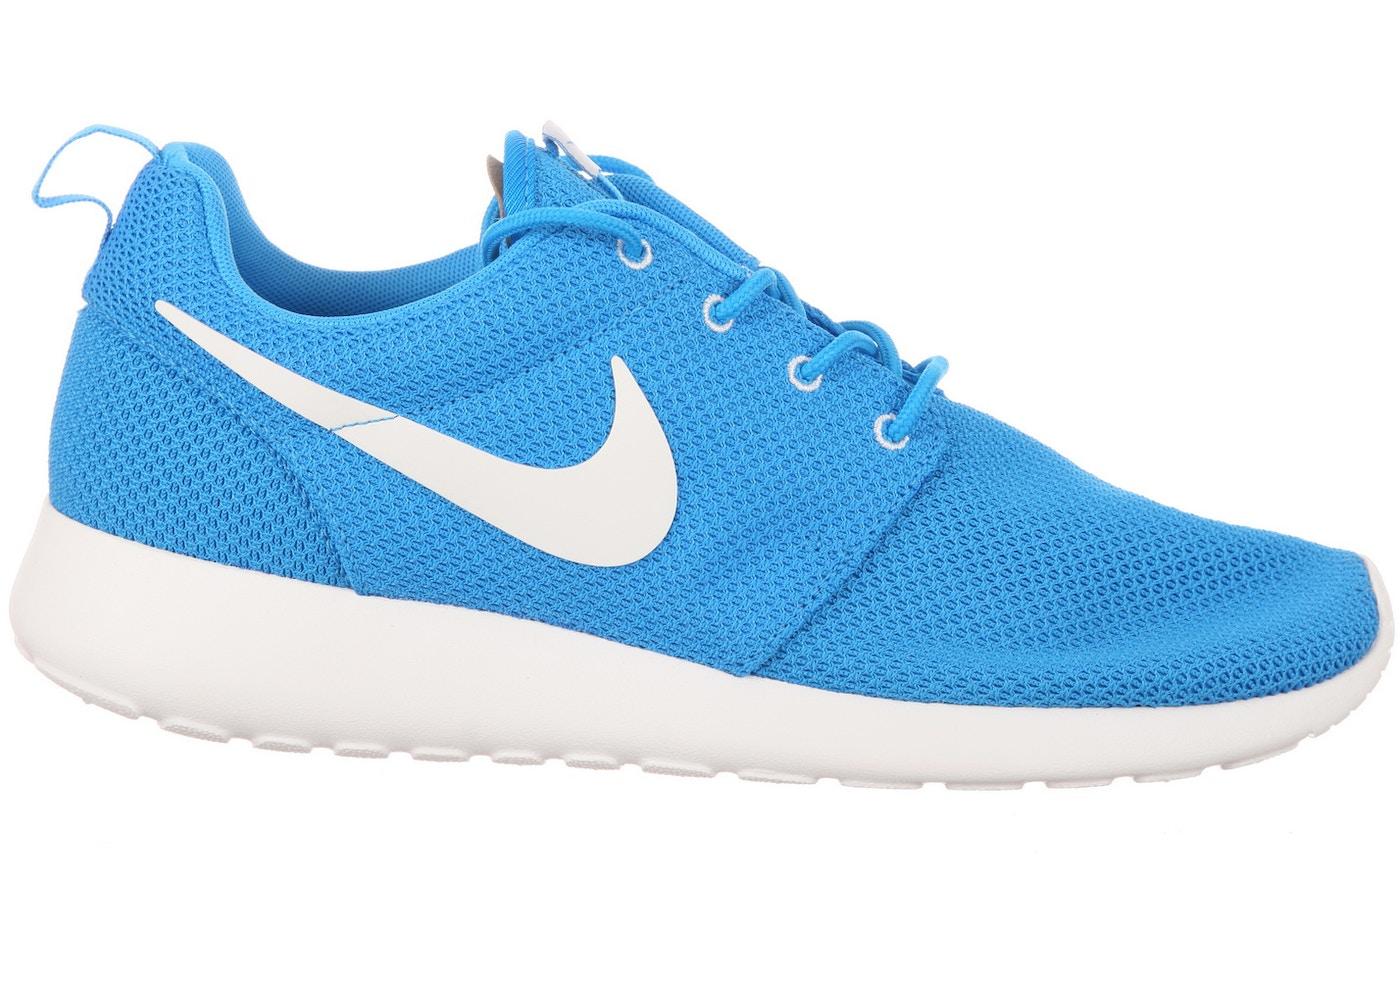 half off 85d4d 0436a Nike Roshe Run Blue Hero - 511881-411